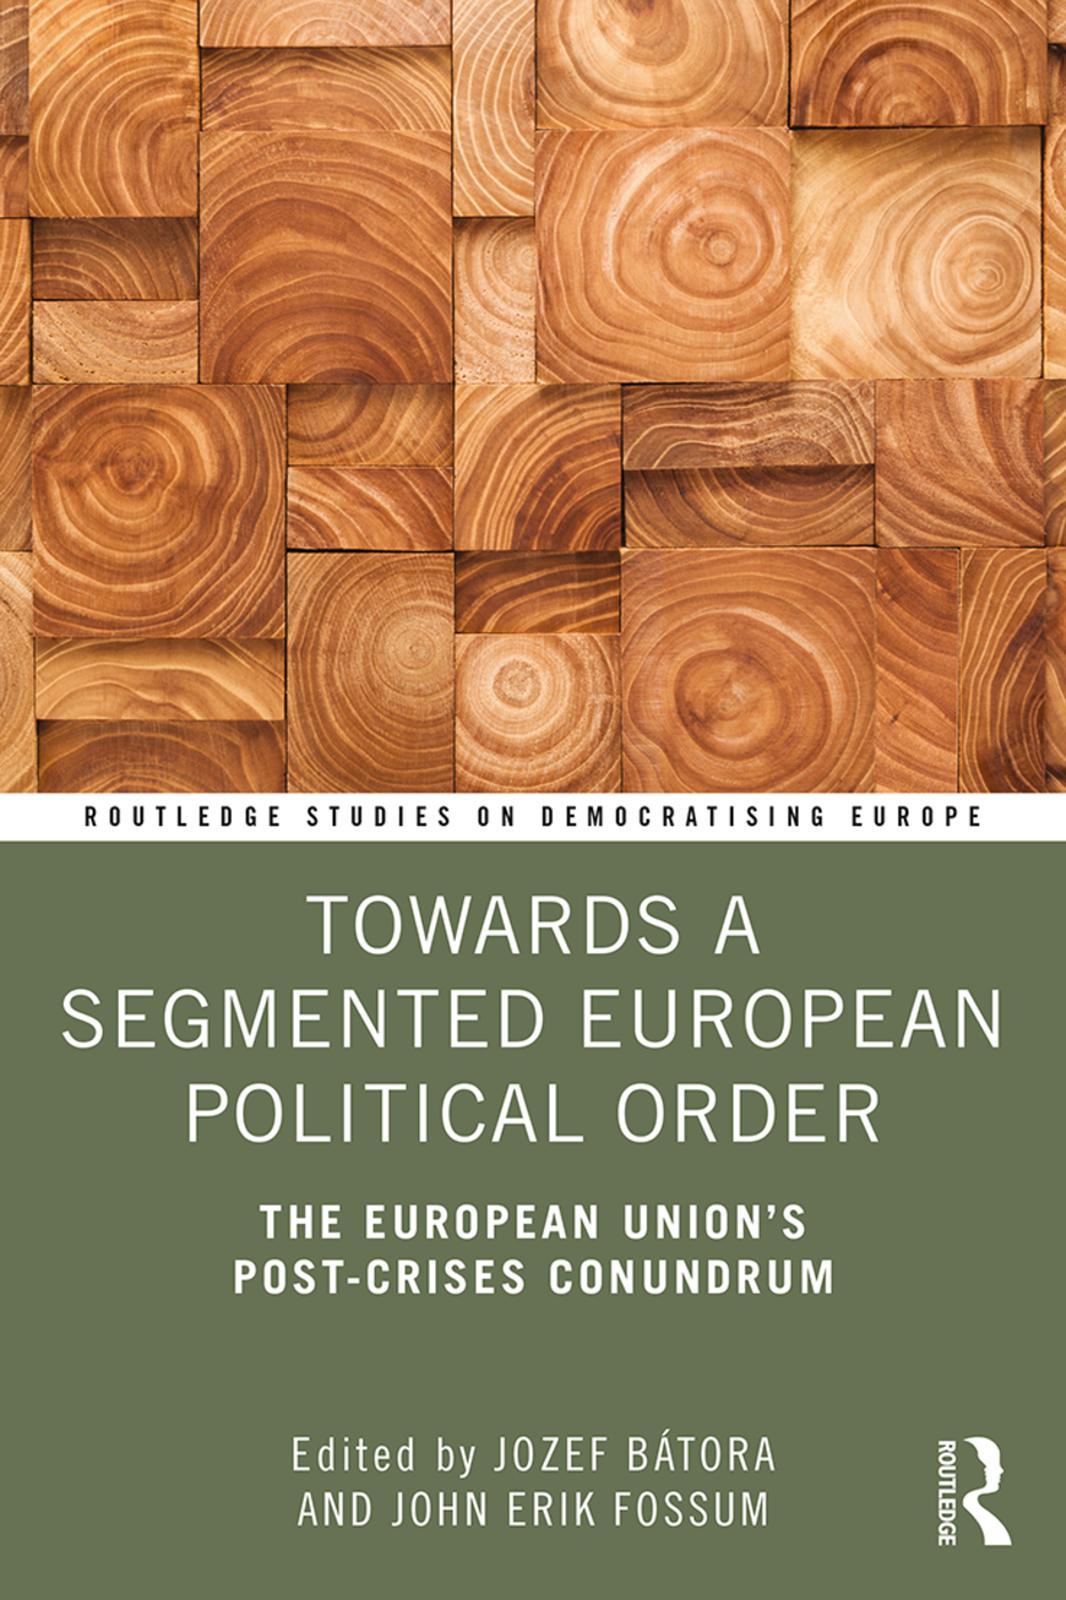 Towards a Segmented European Political Order: The European Union's Post-crises Conundrum book cover